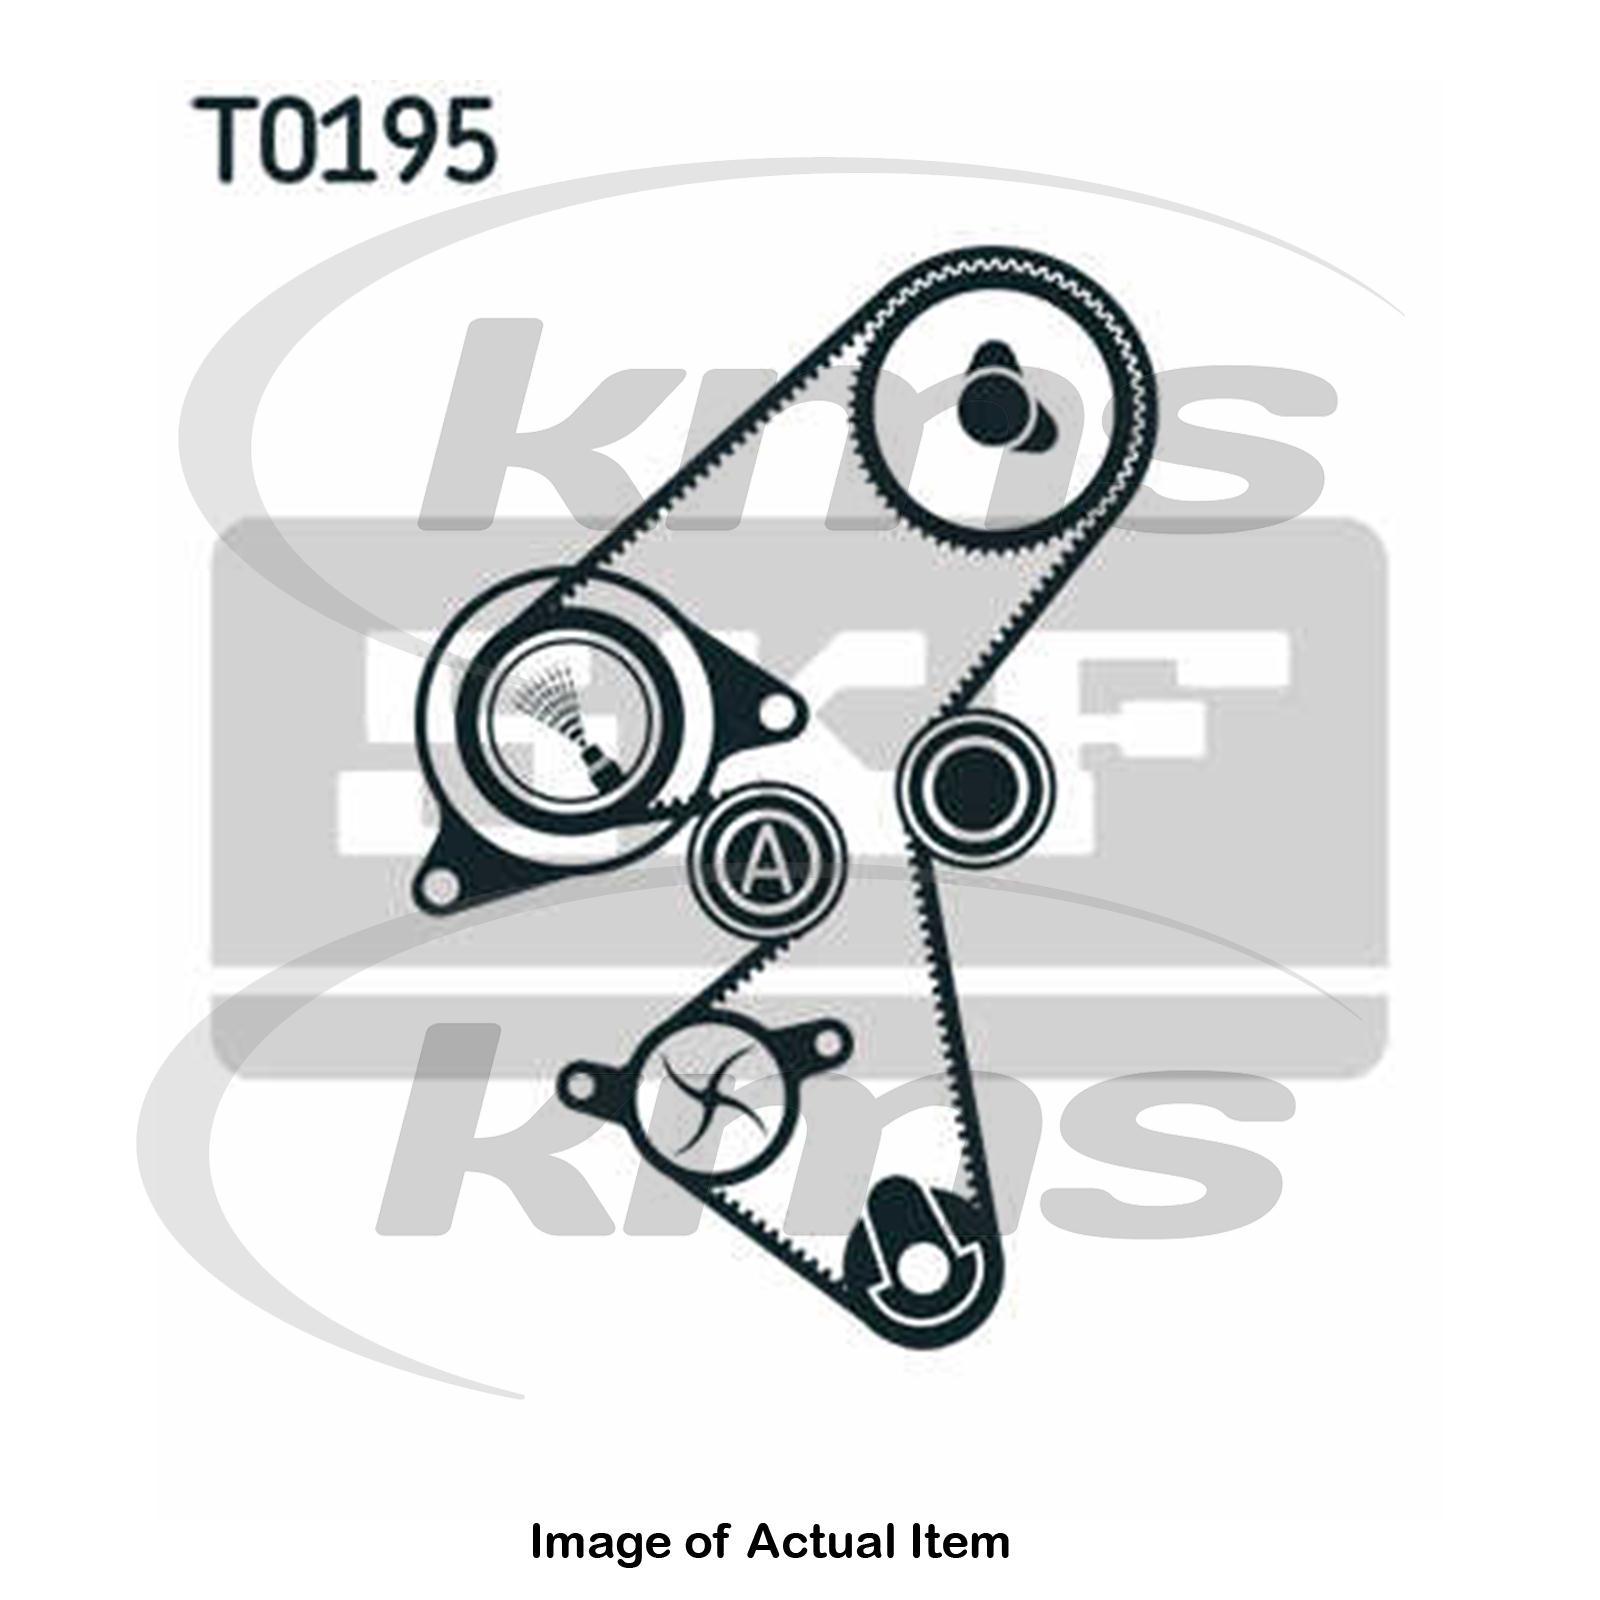 New Genuine Skf Timing Cam Belt Kit Vkma 03141 Top Quality Ebay For Suzuki Liana Sentinel